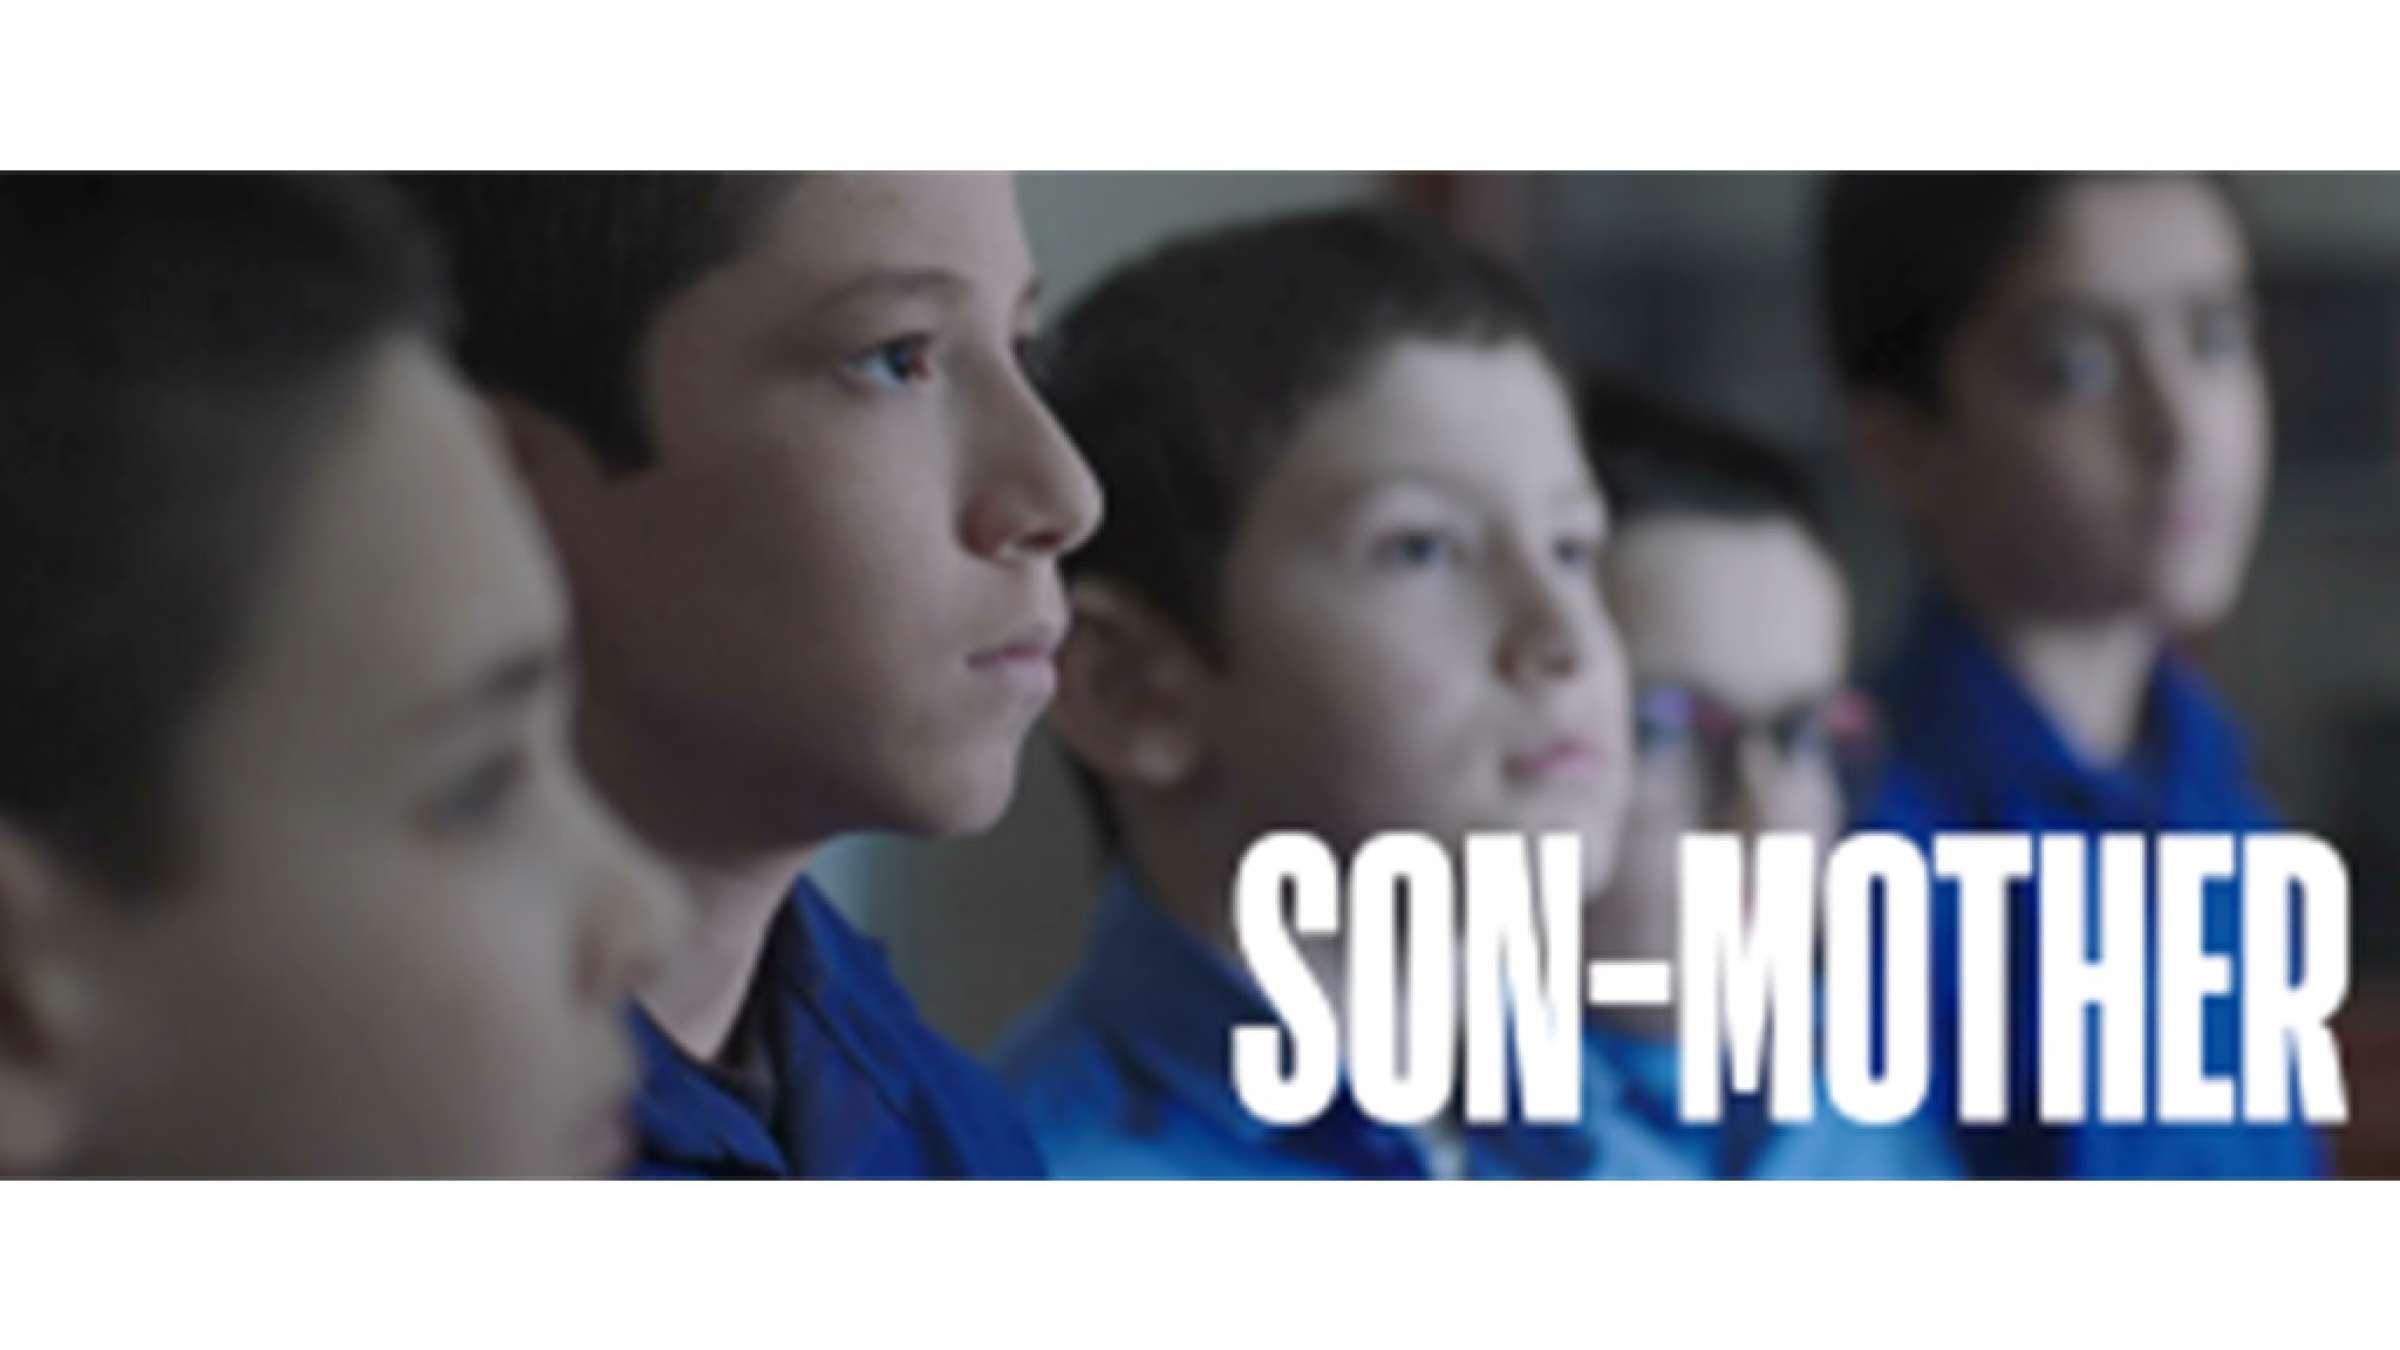 هنری-شهرام-بینش--جشنواره-فیلم-تورنتو-به-پایان-رسید-پسر-مادر